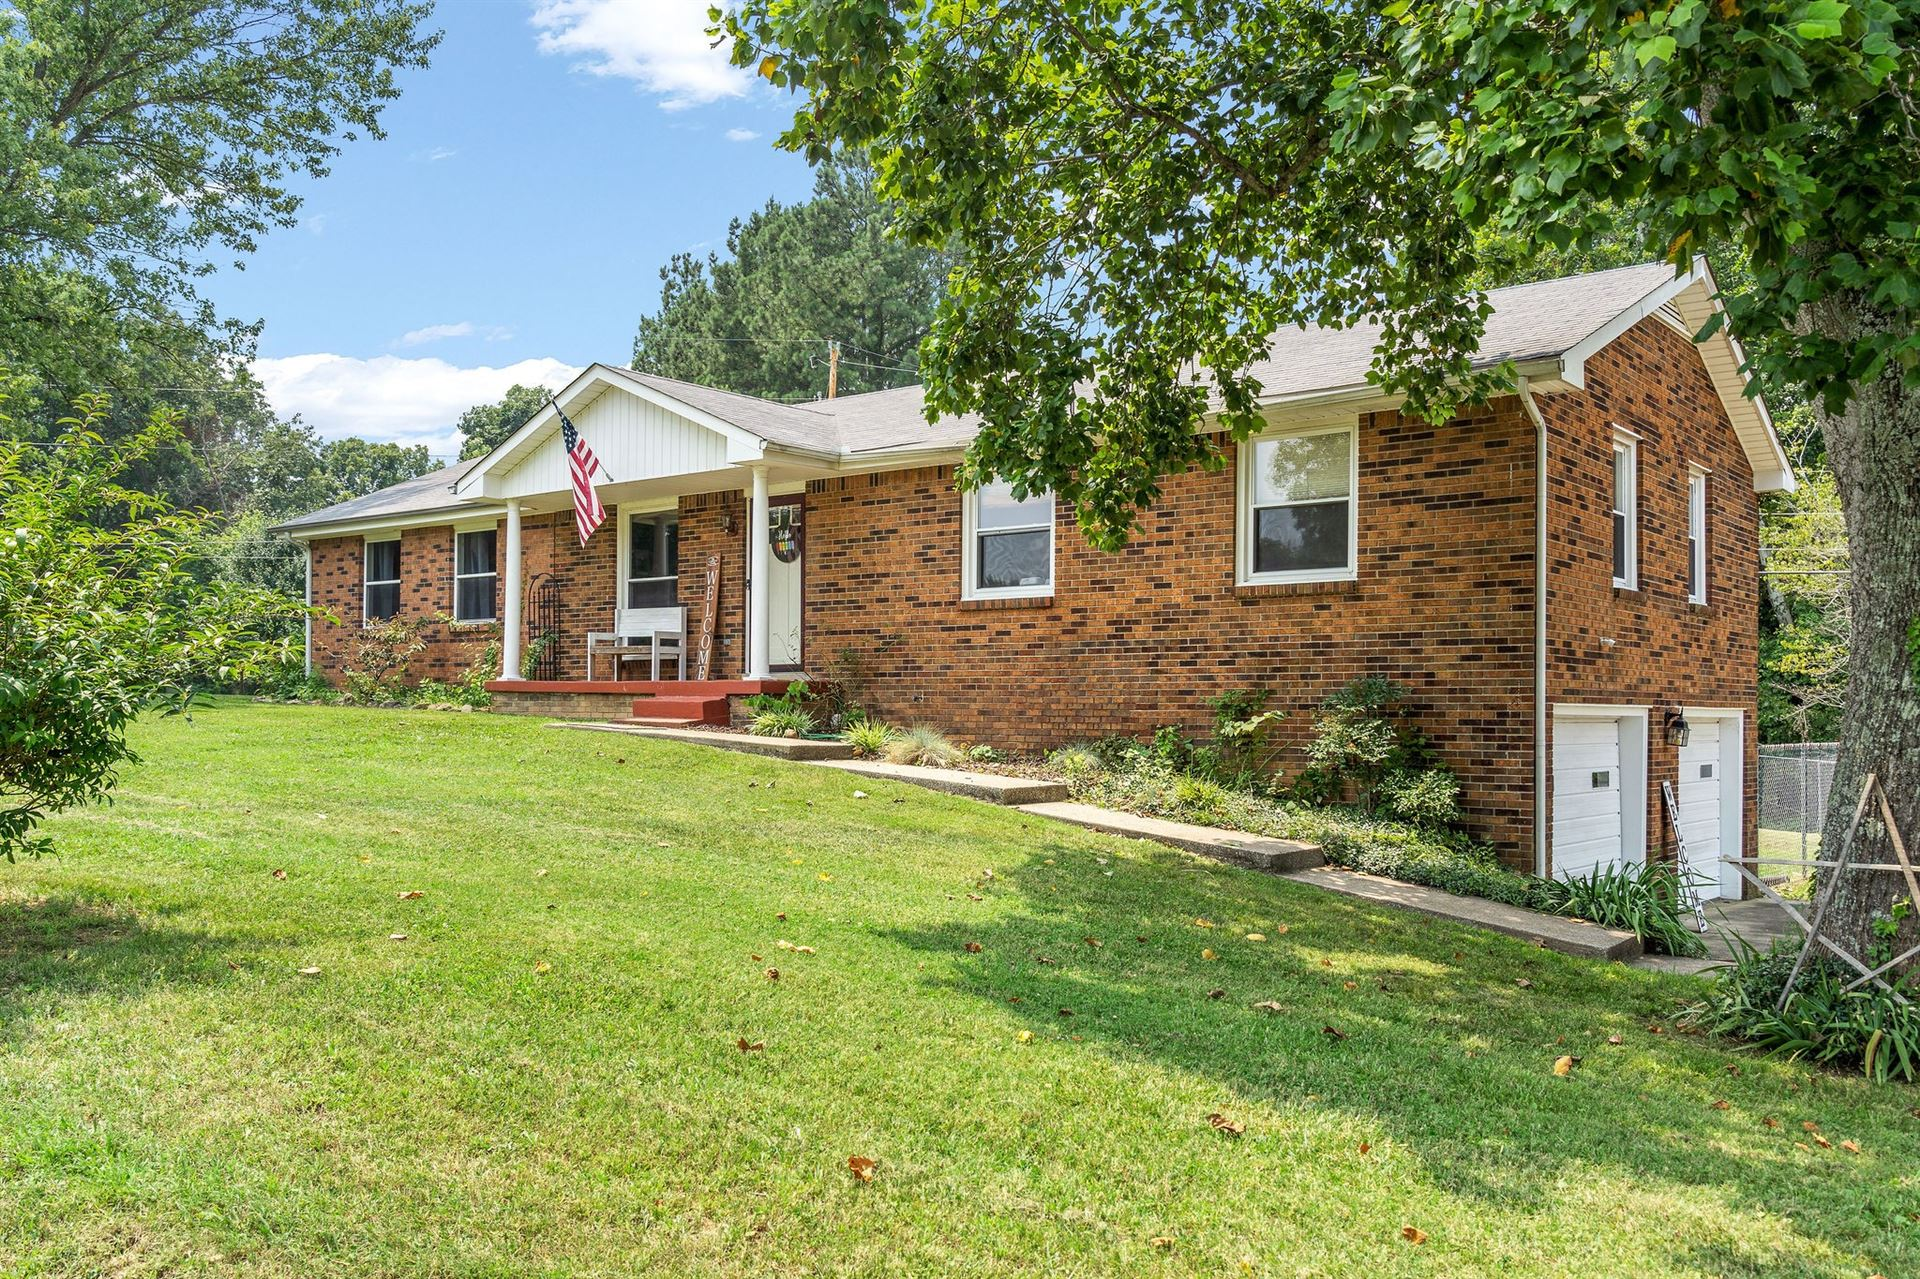 424 Hilltop Dr, Clarksville, TN 37040 - MLS#: 2275413